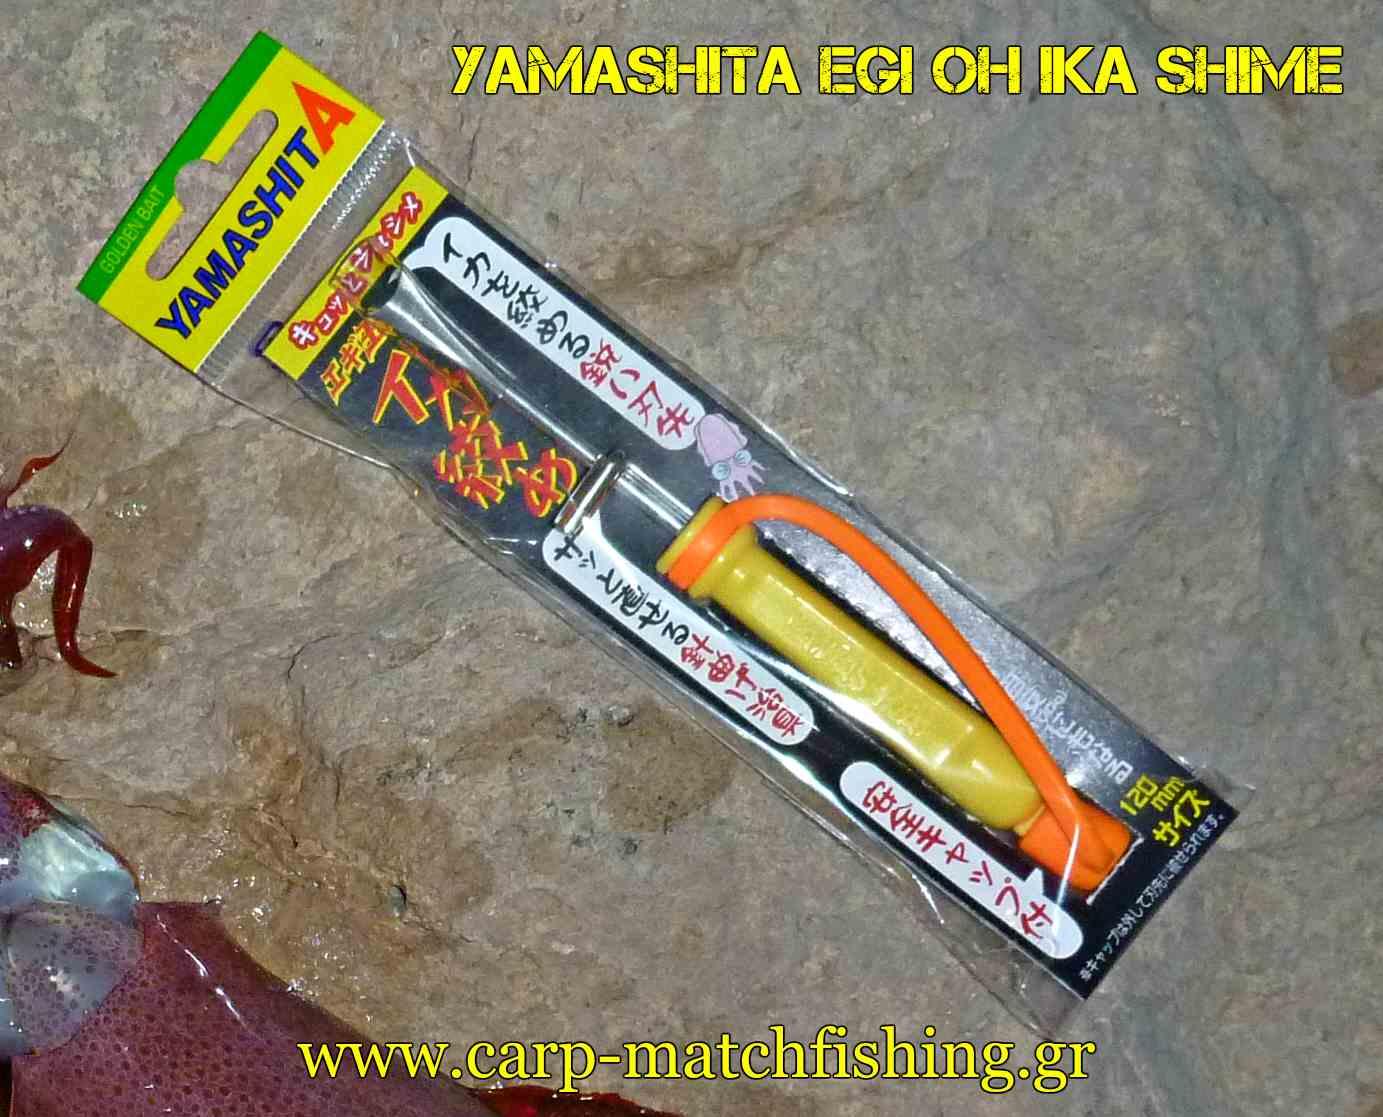 -yamashita-egi-oh-ika-shime-eging-carpmatchfishing